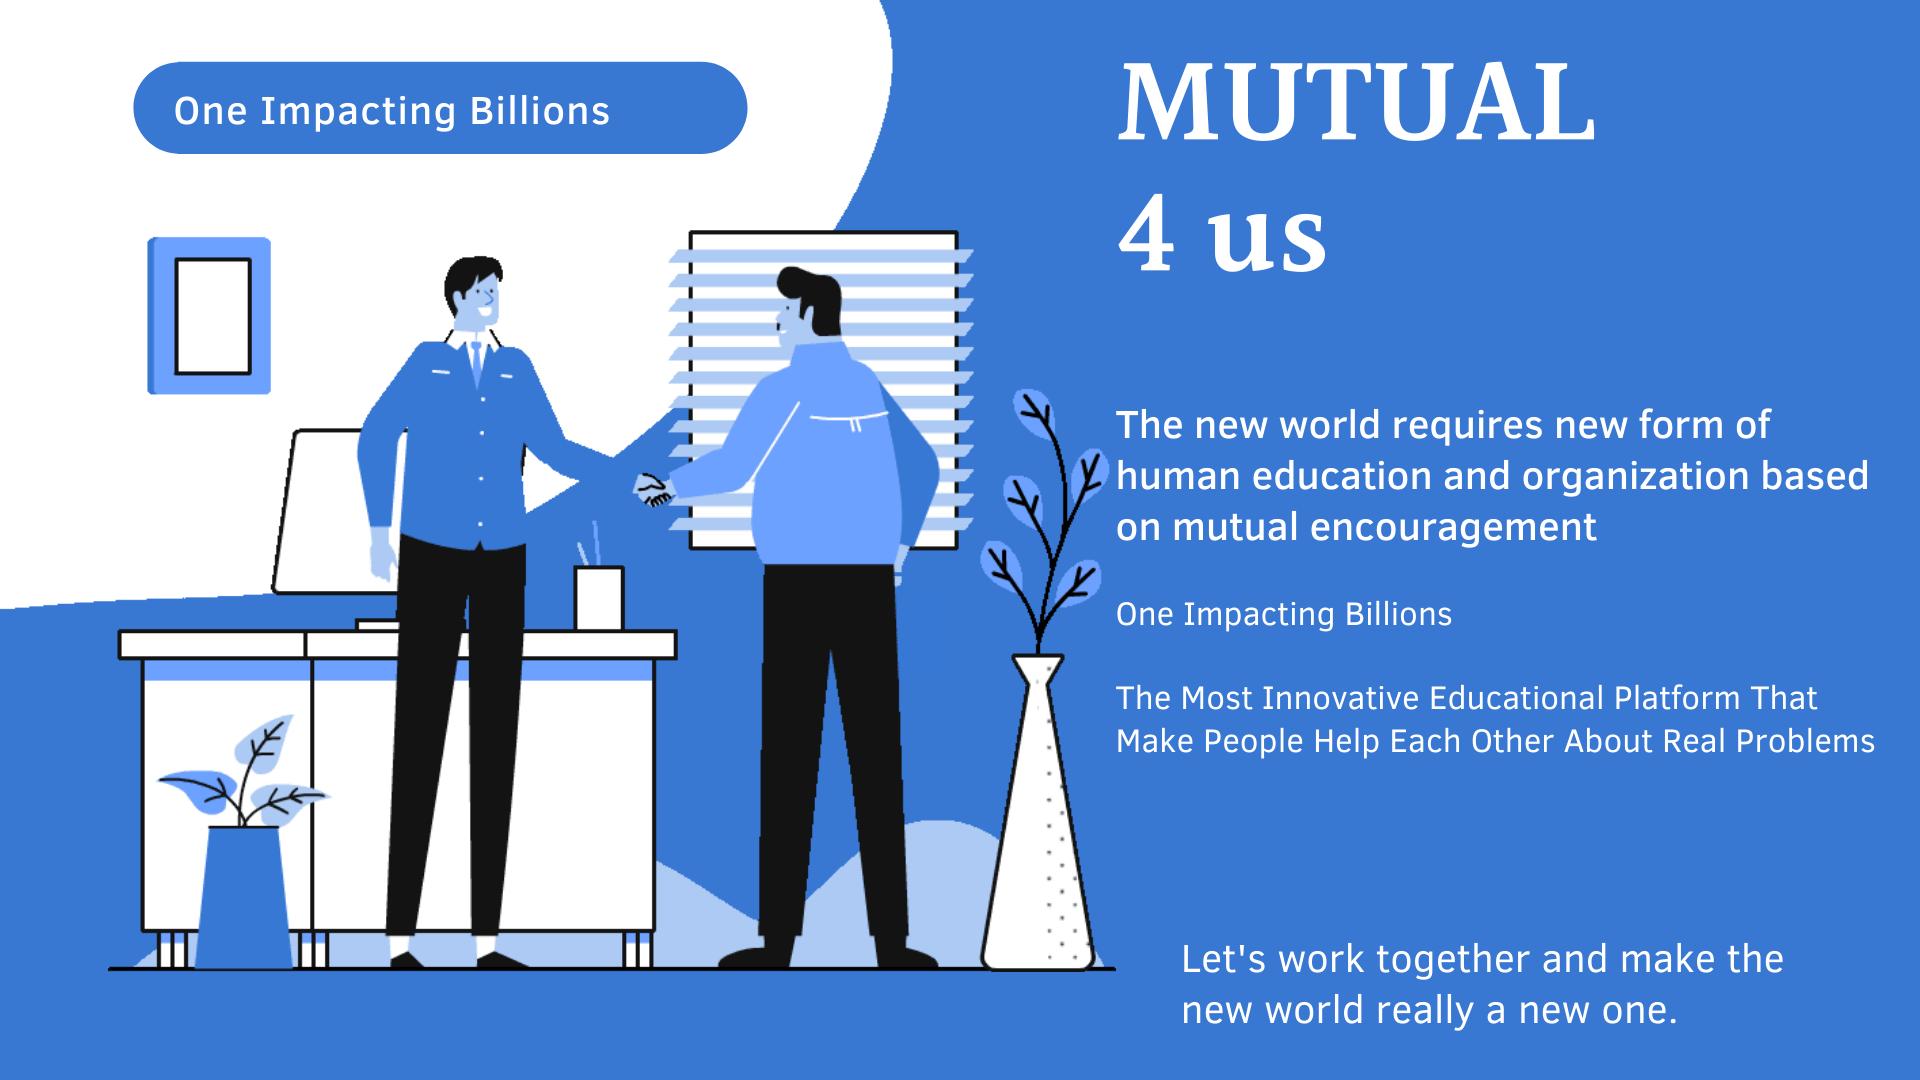 MUTUAL4us One Impacting Billions